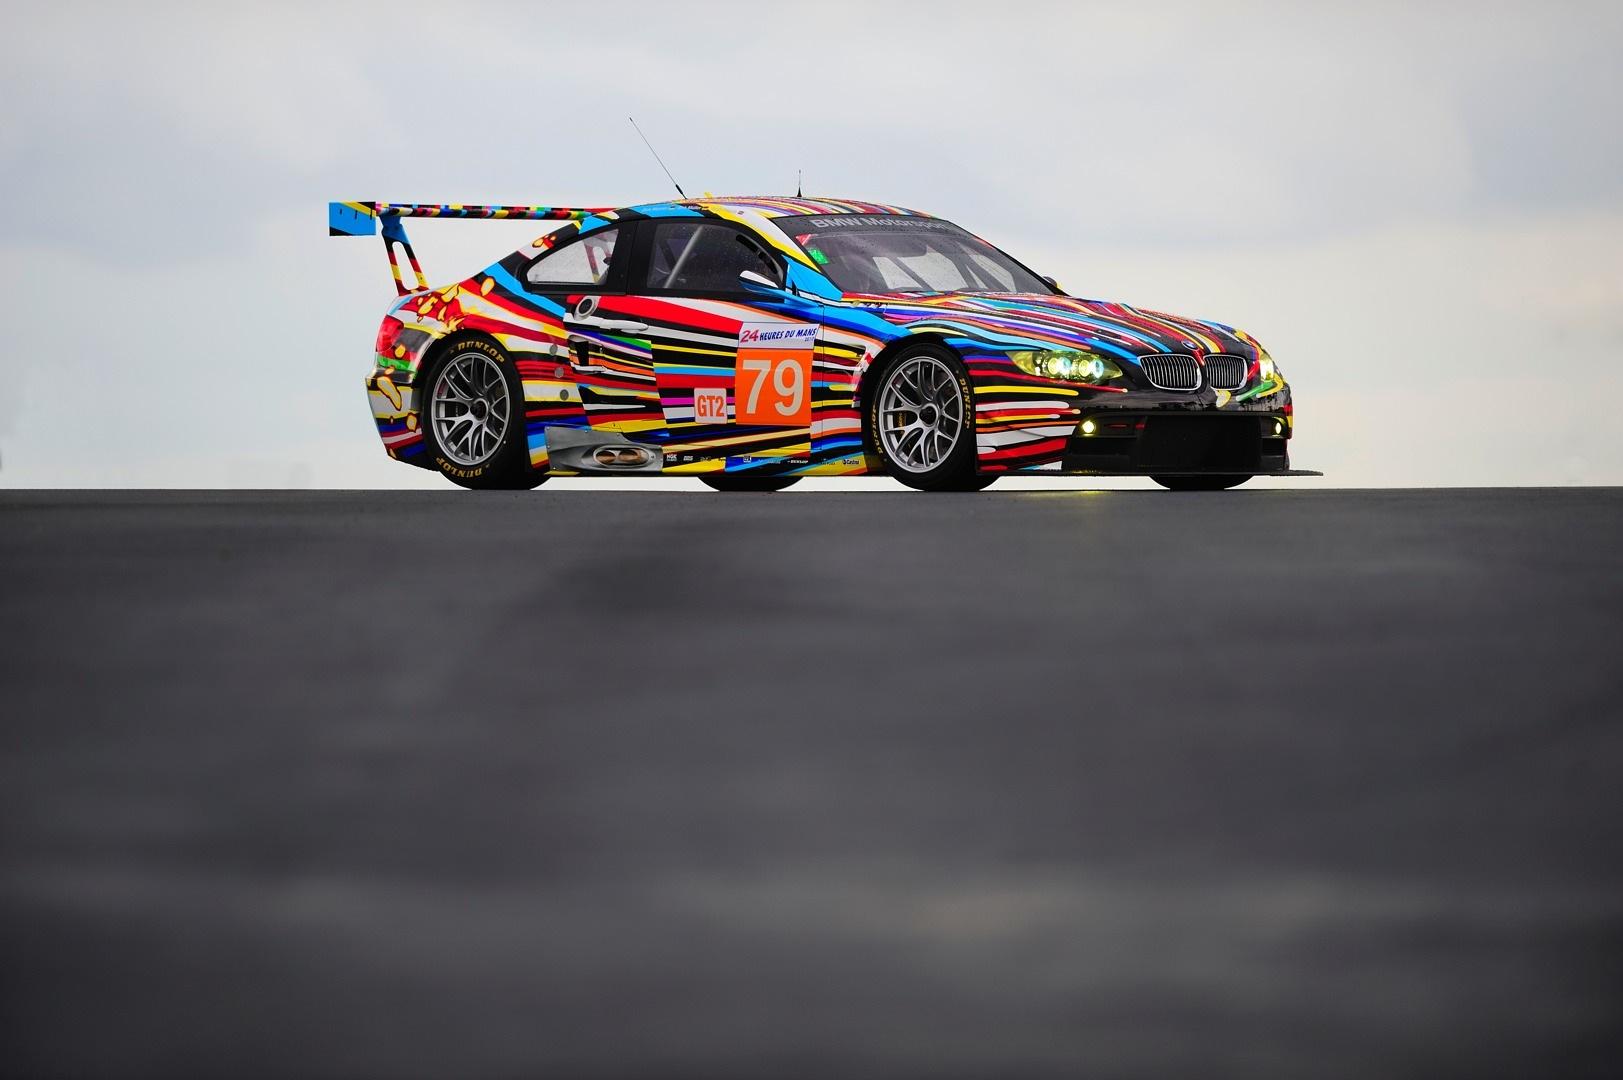 Jeff Koons Art Car M3 Wallpaper Collection - autoevolution